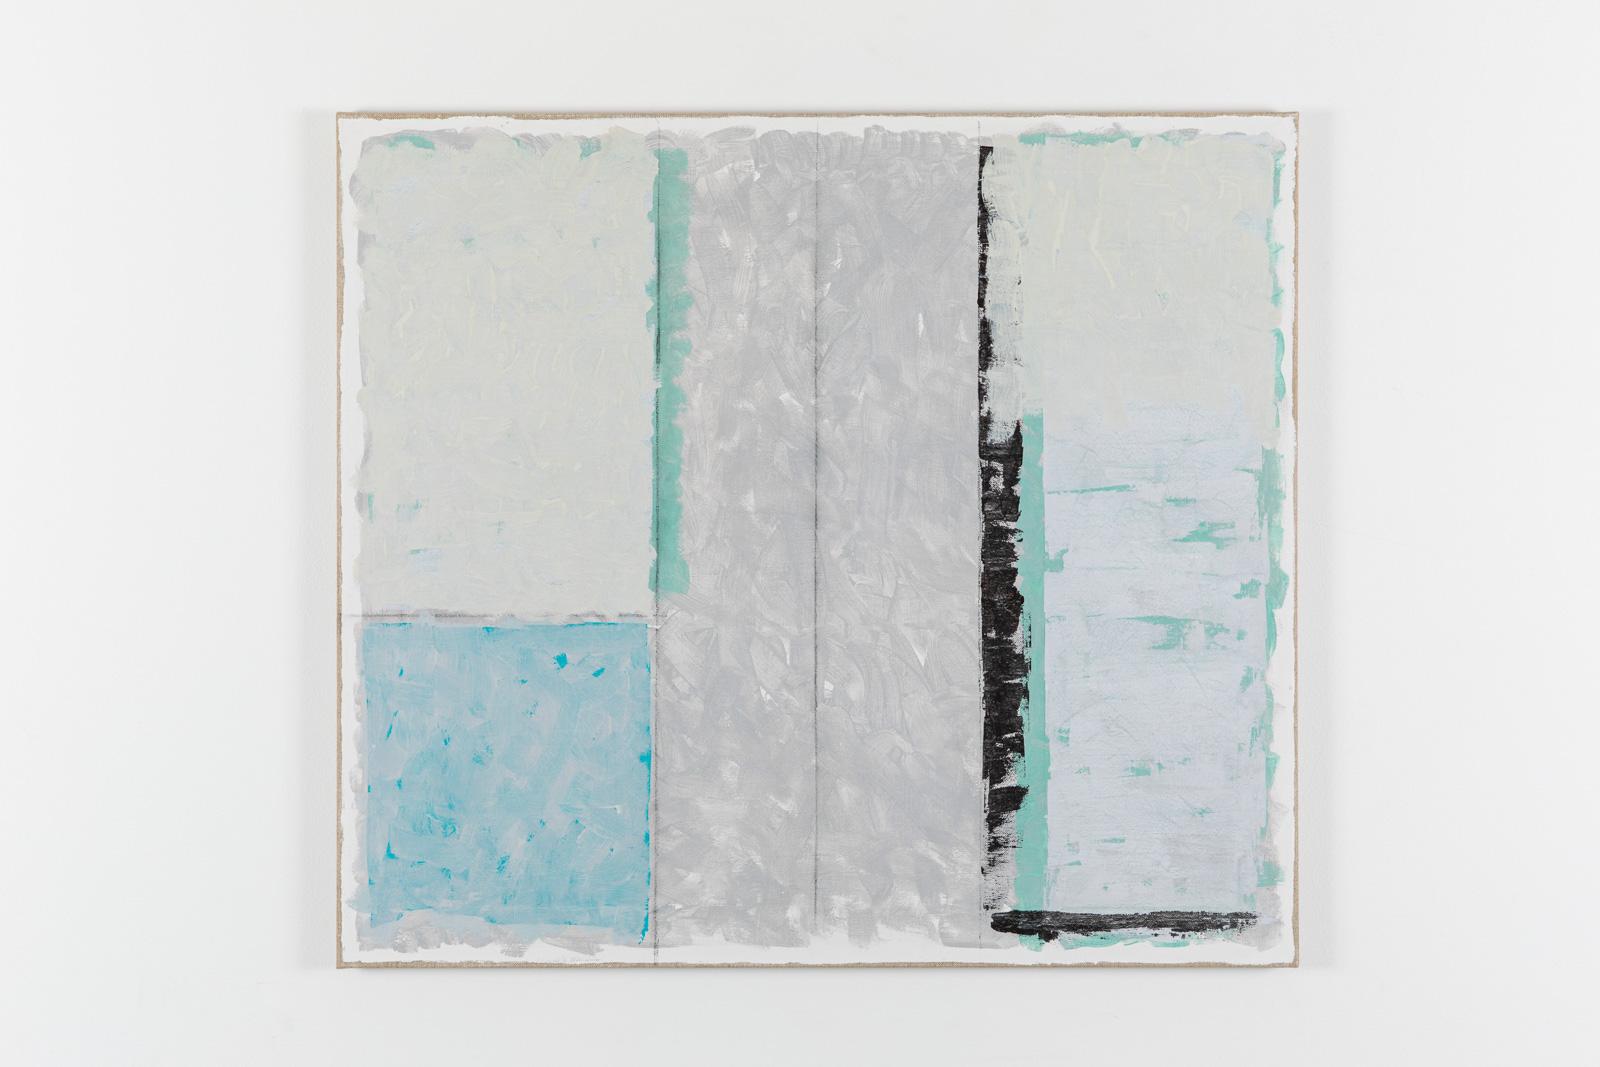 Vila Ziza 9, 2018, Egg tempera on canvas, 80 x 90 cm